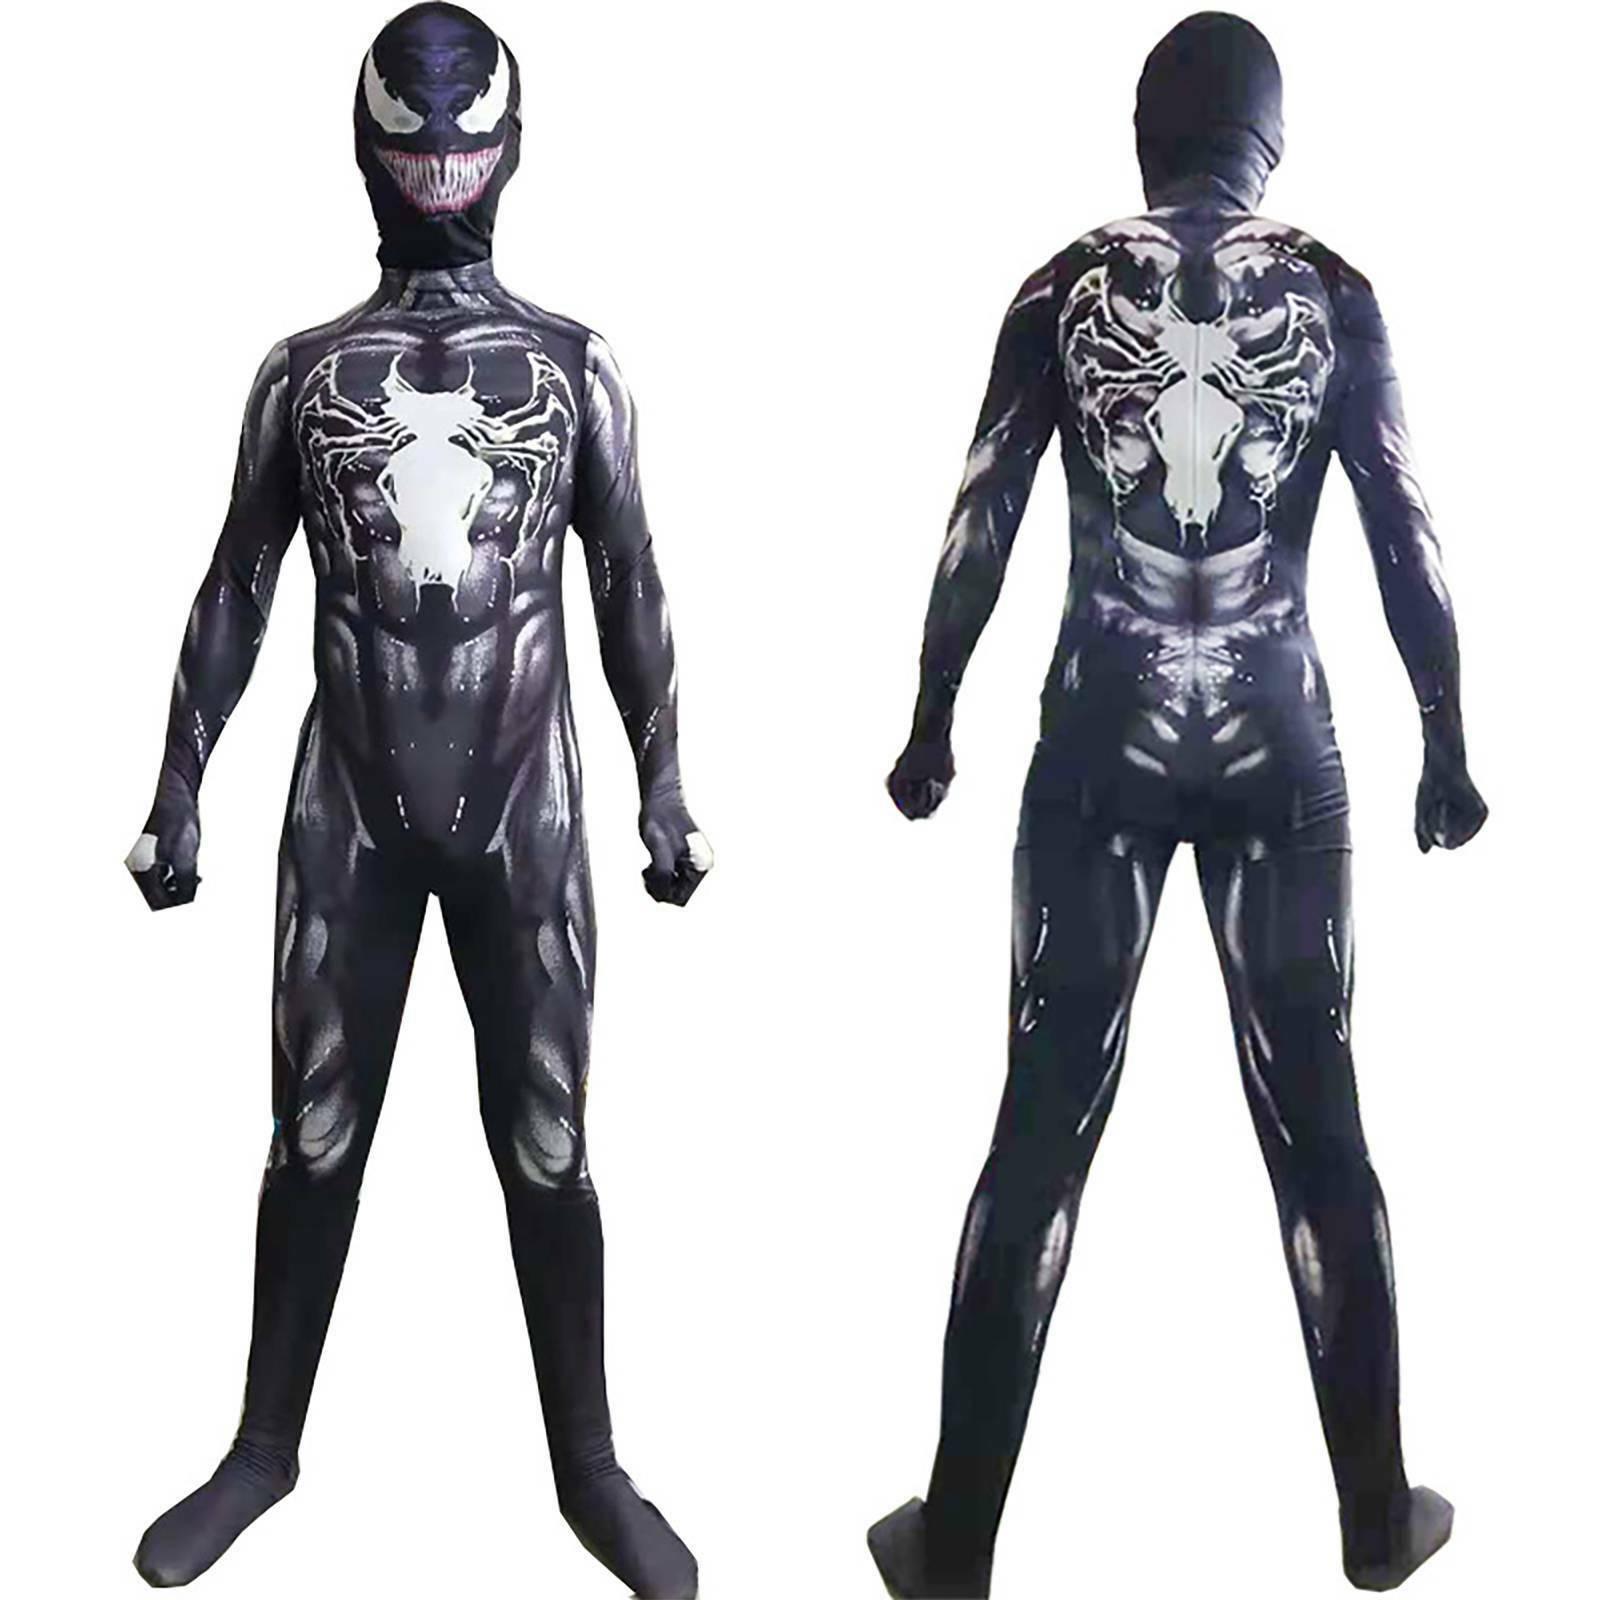 Spider-man Symbiote Black Cat Cosplay Costume Bodysuit